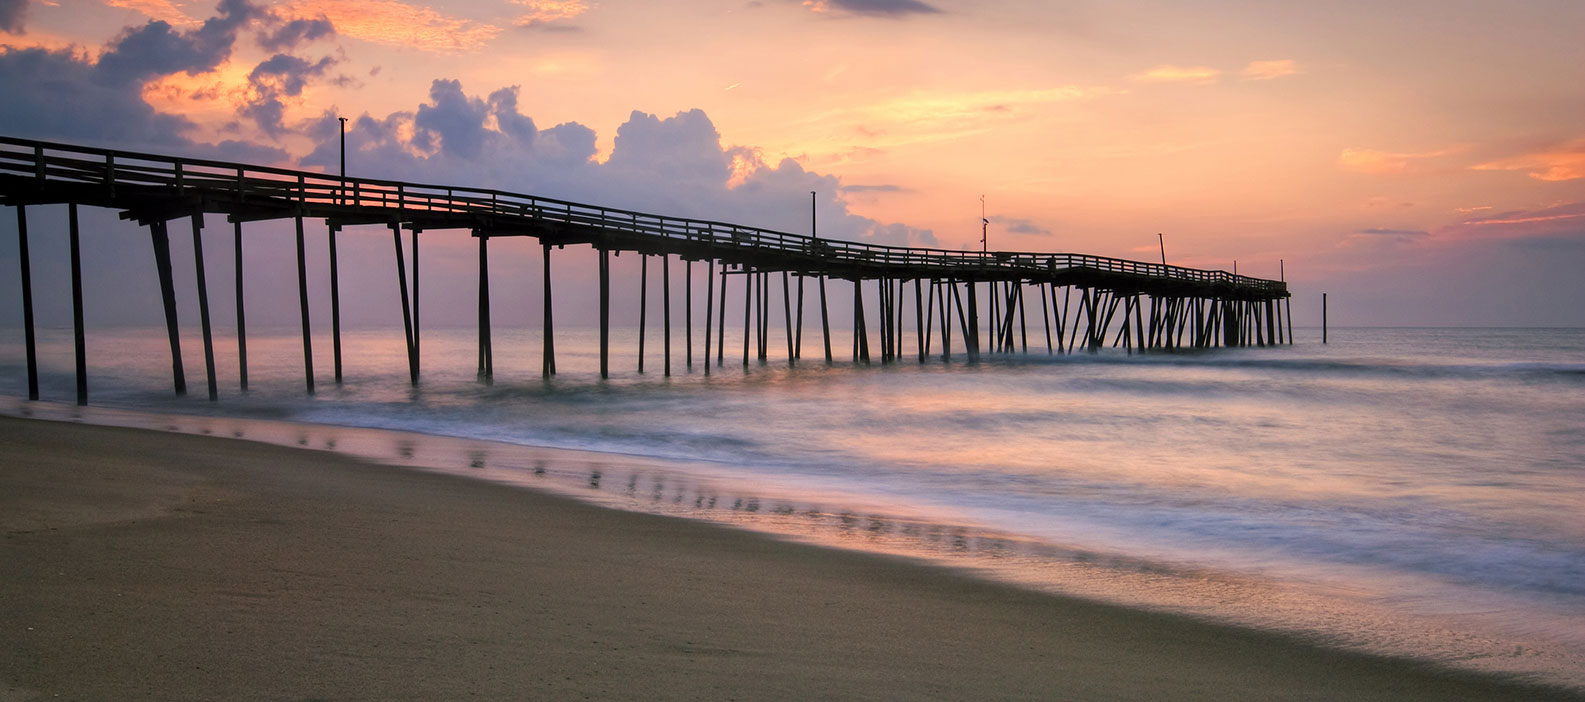 North Carolina Beach Vacation Rentals Sunset Beach Vacations